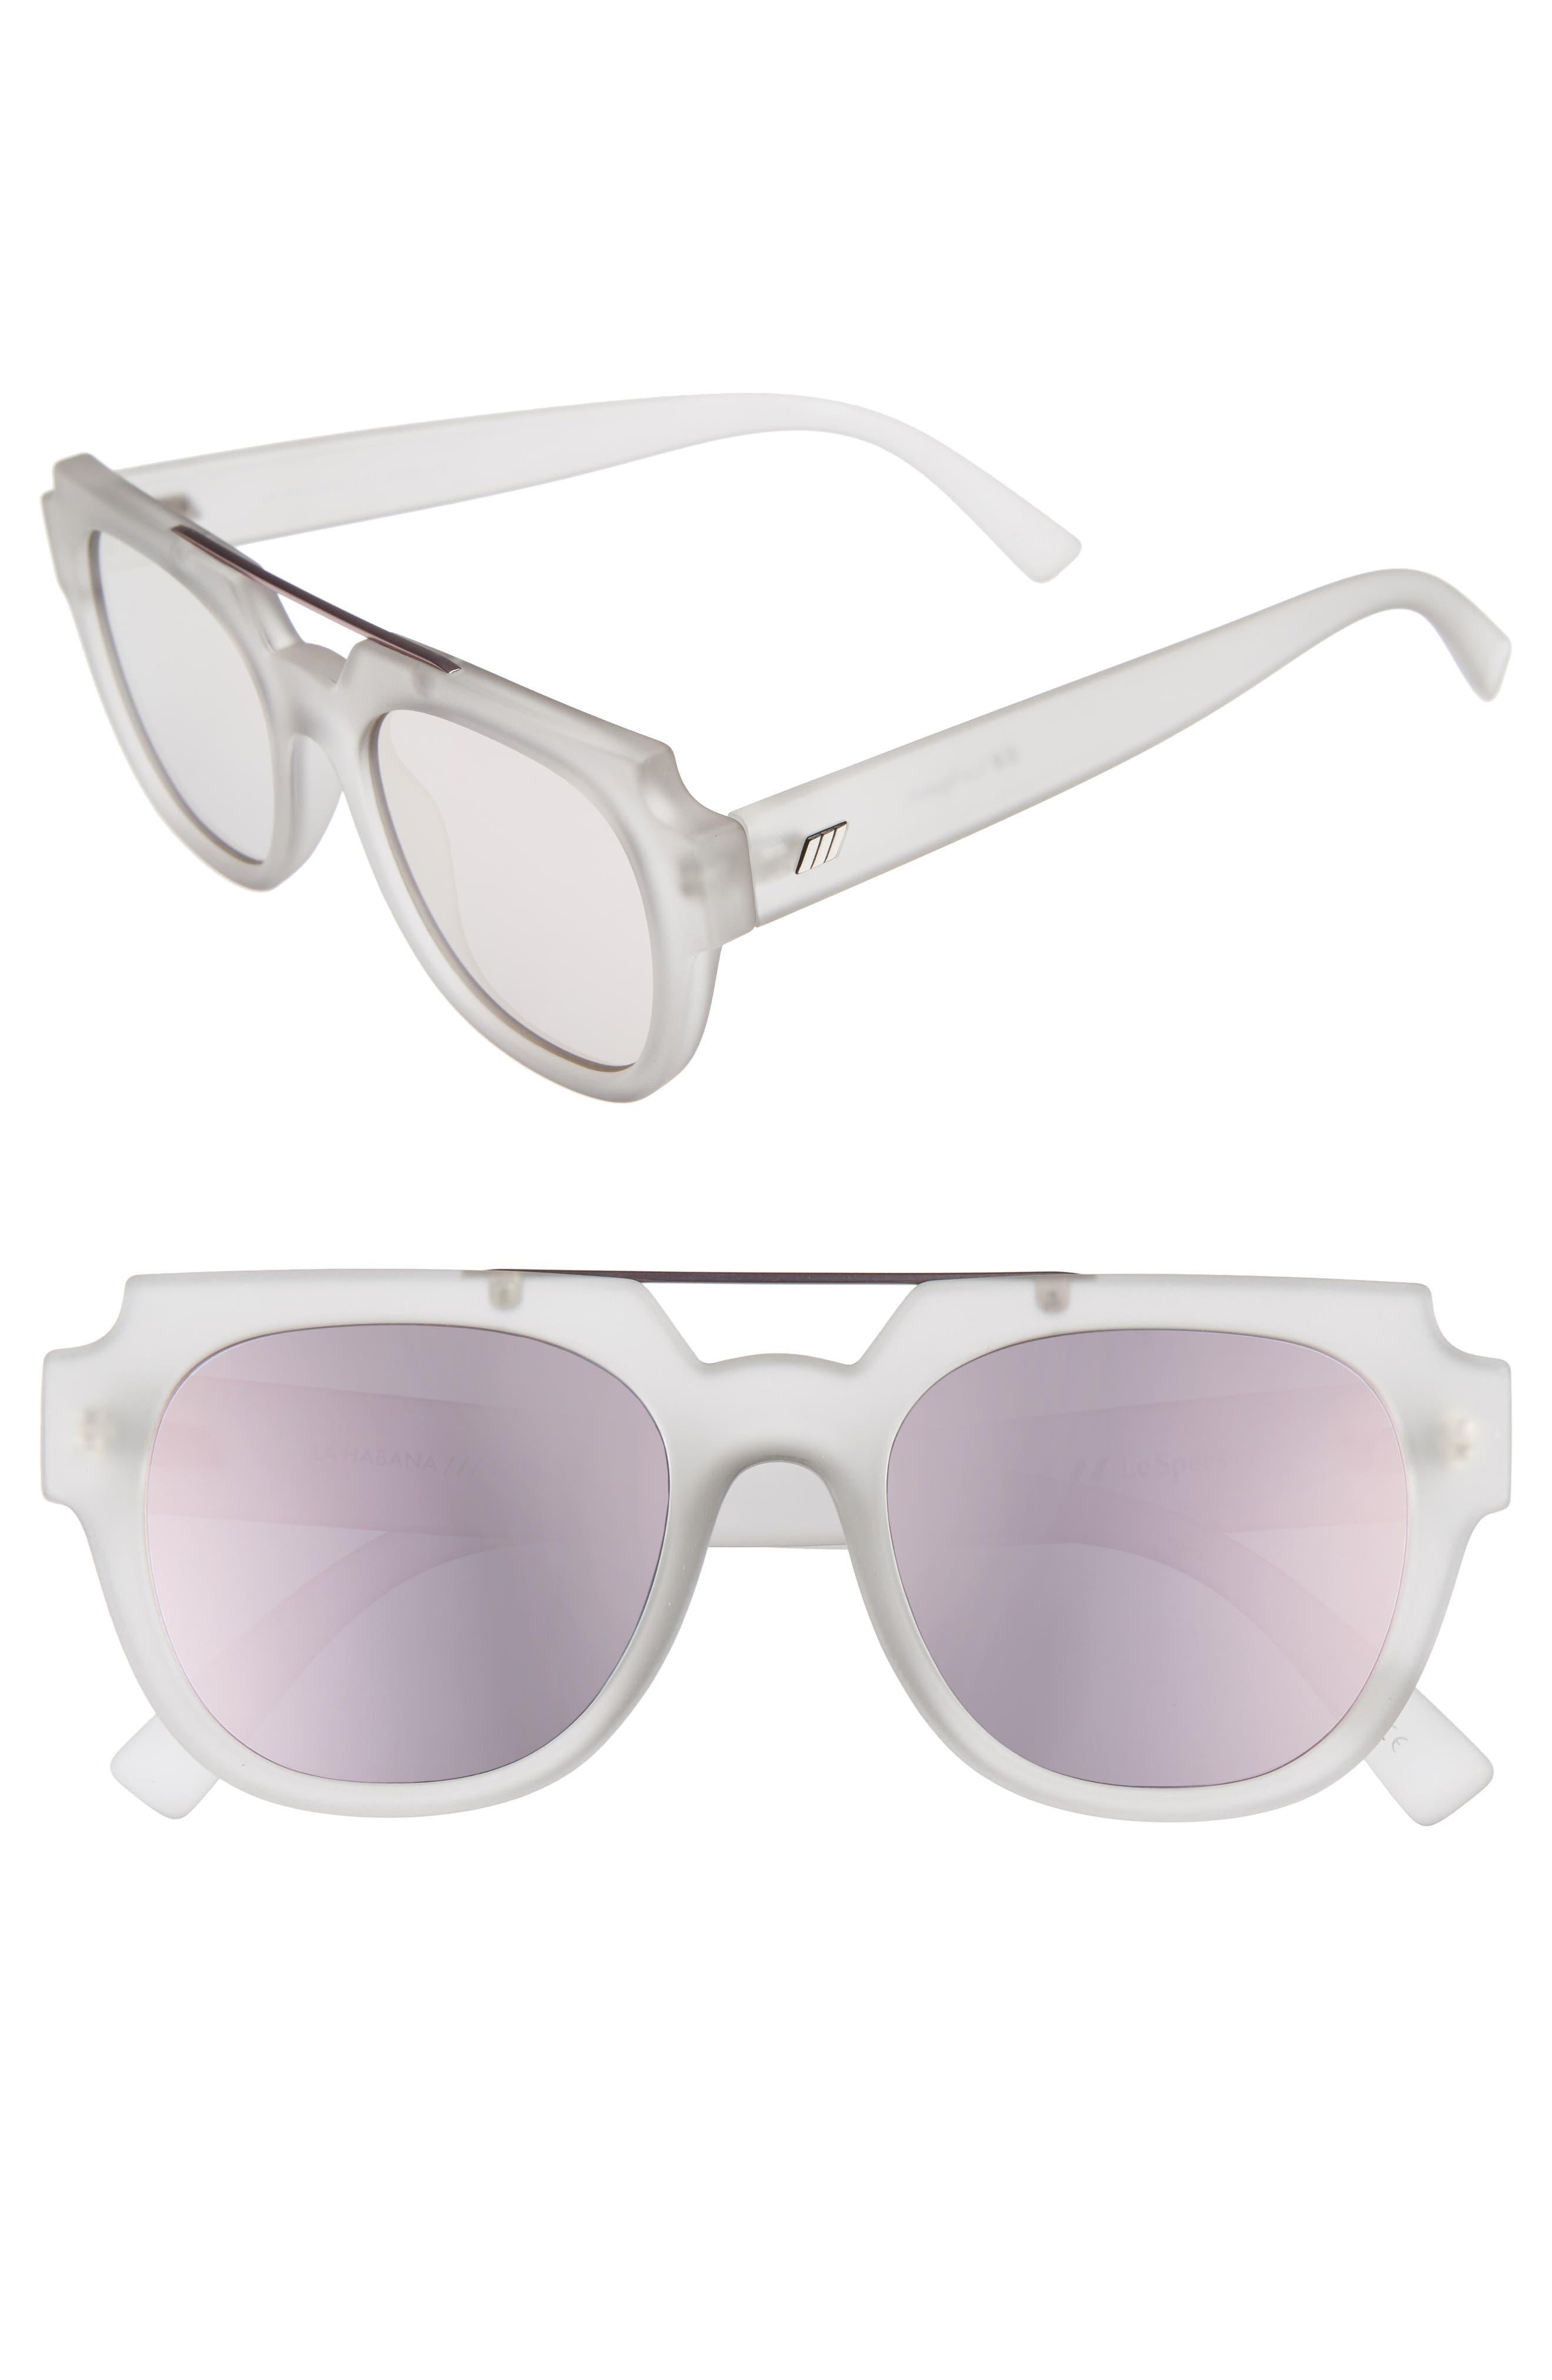 La Habana 52mm Retro Sunglasses,                             Alternate thumbnail 5, color,